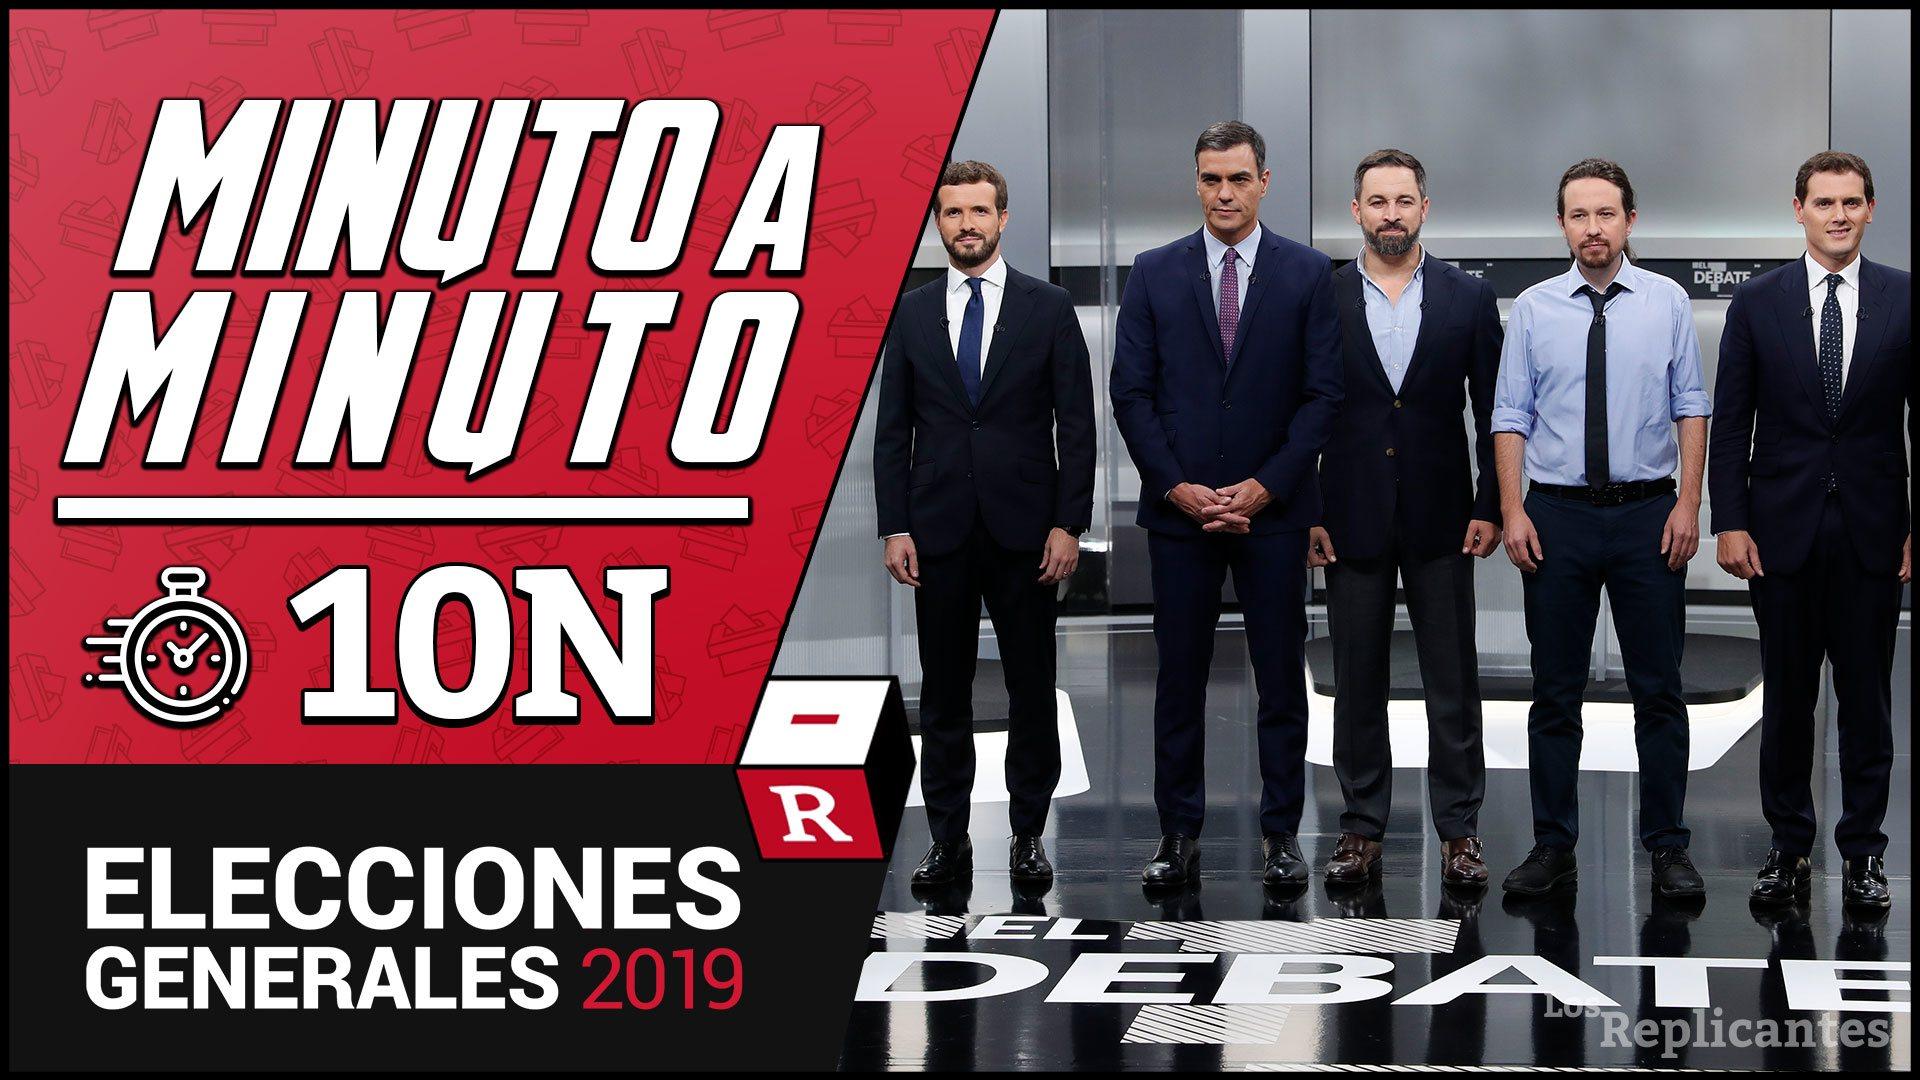 57,13% escrutado: PSOE (124), PP (85), VOX (50), UP (35), ERC (13), Cs (10), JxCAT (8), PNV (7), EH Bildu (5), Más País (3), CUP (2)